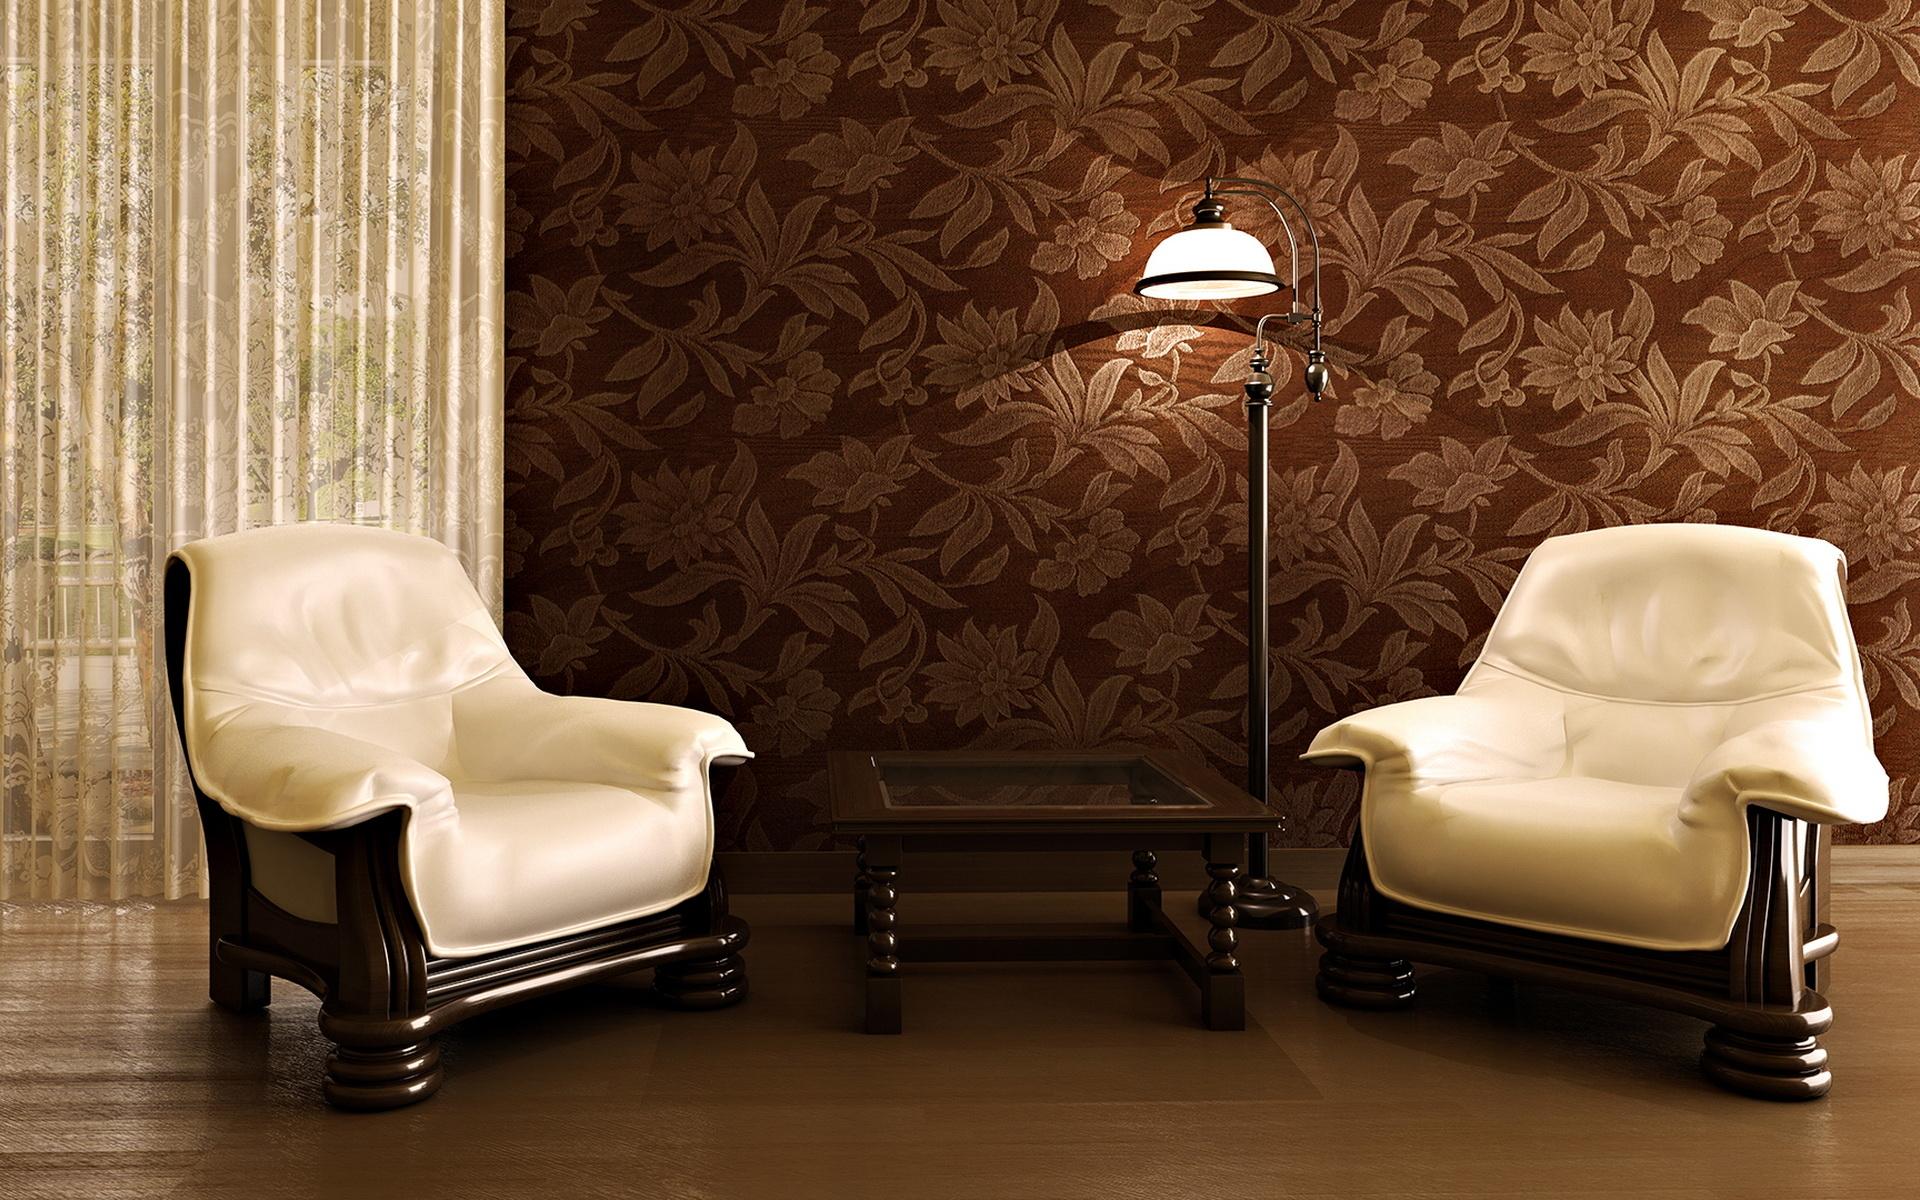 50+] Wallpaper Designs for Living Room on WallpaperSafari